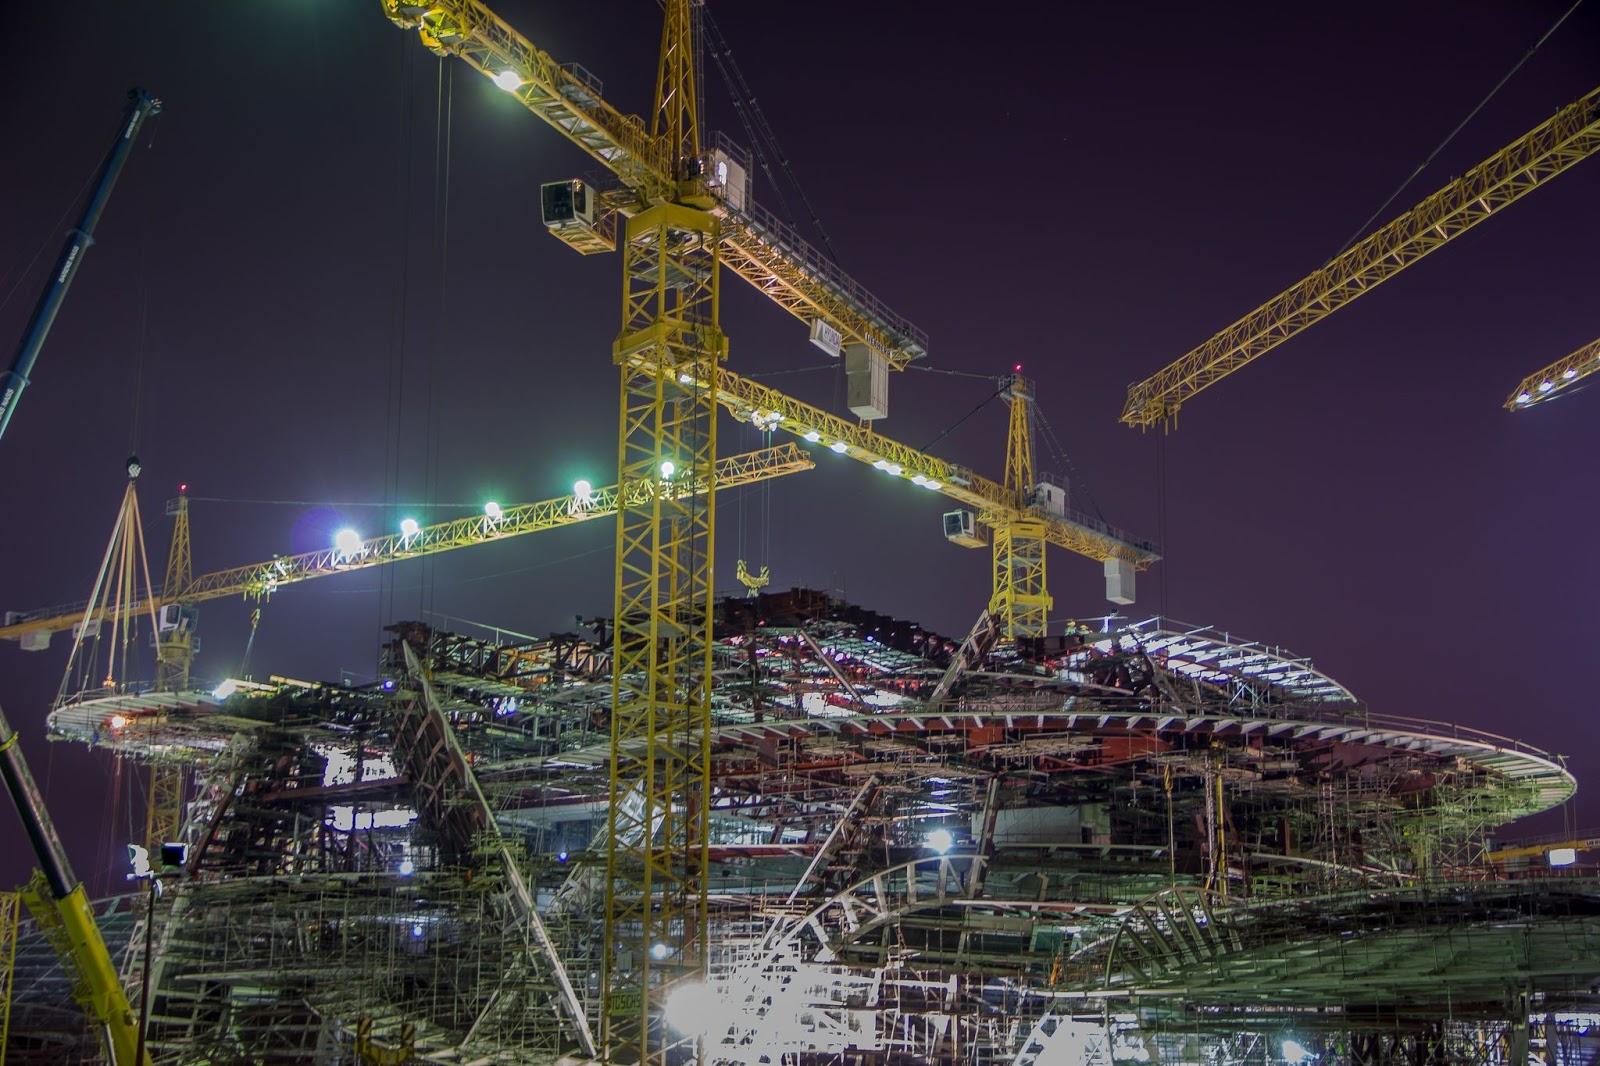 National musuem of qatar construction pinterest for Architecture companies qatar